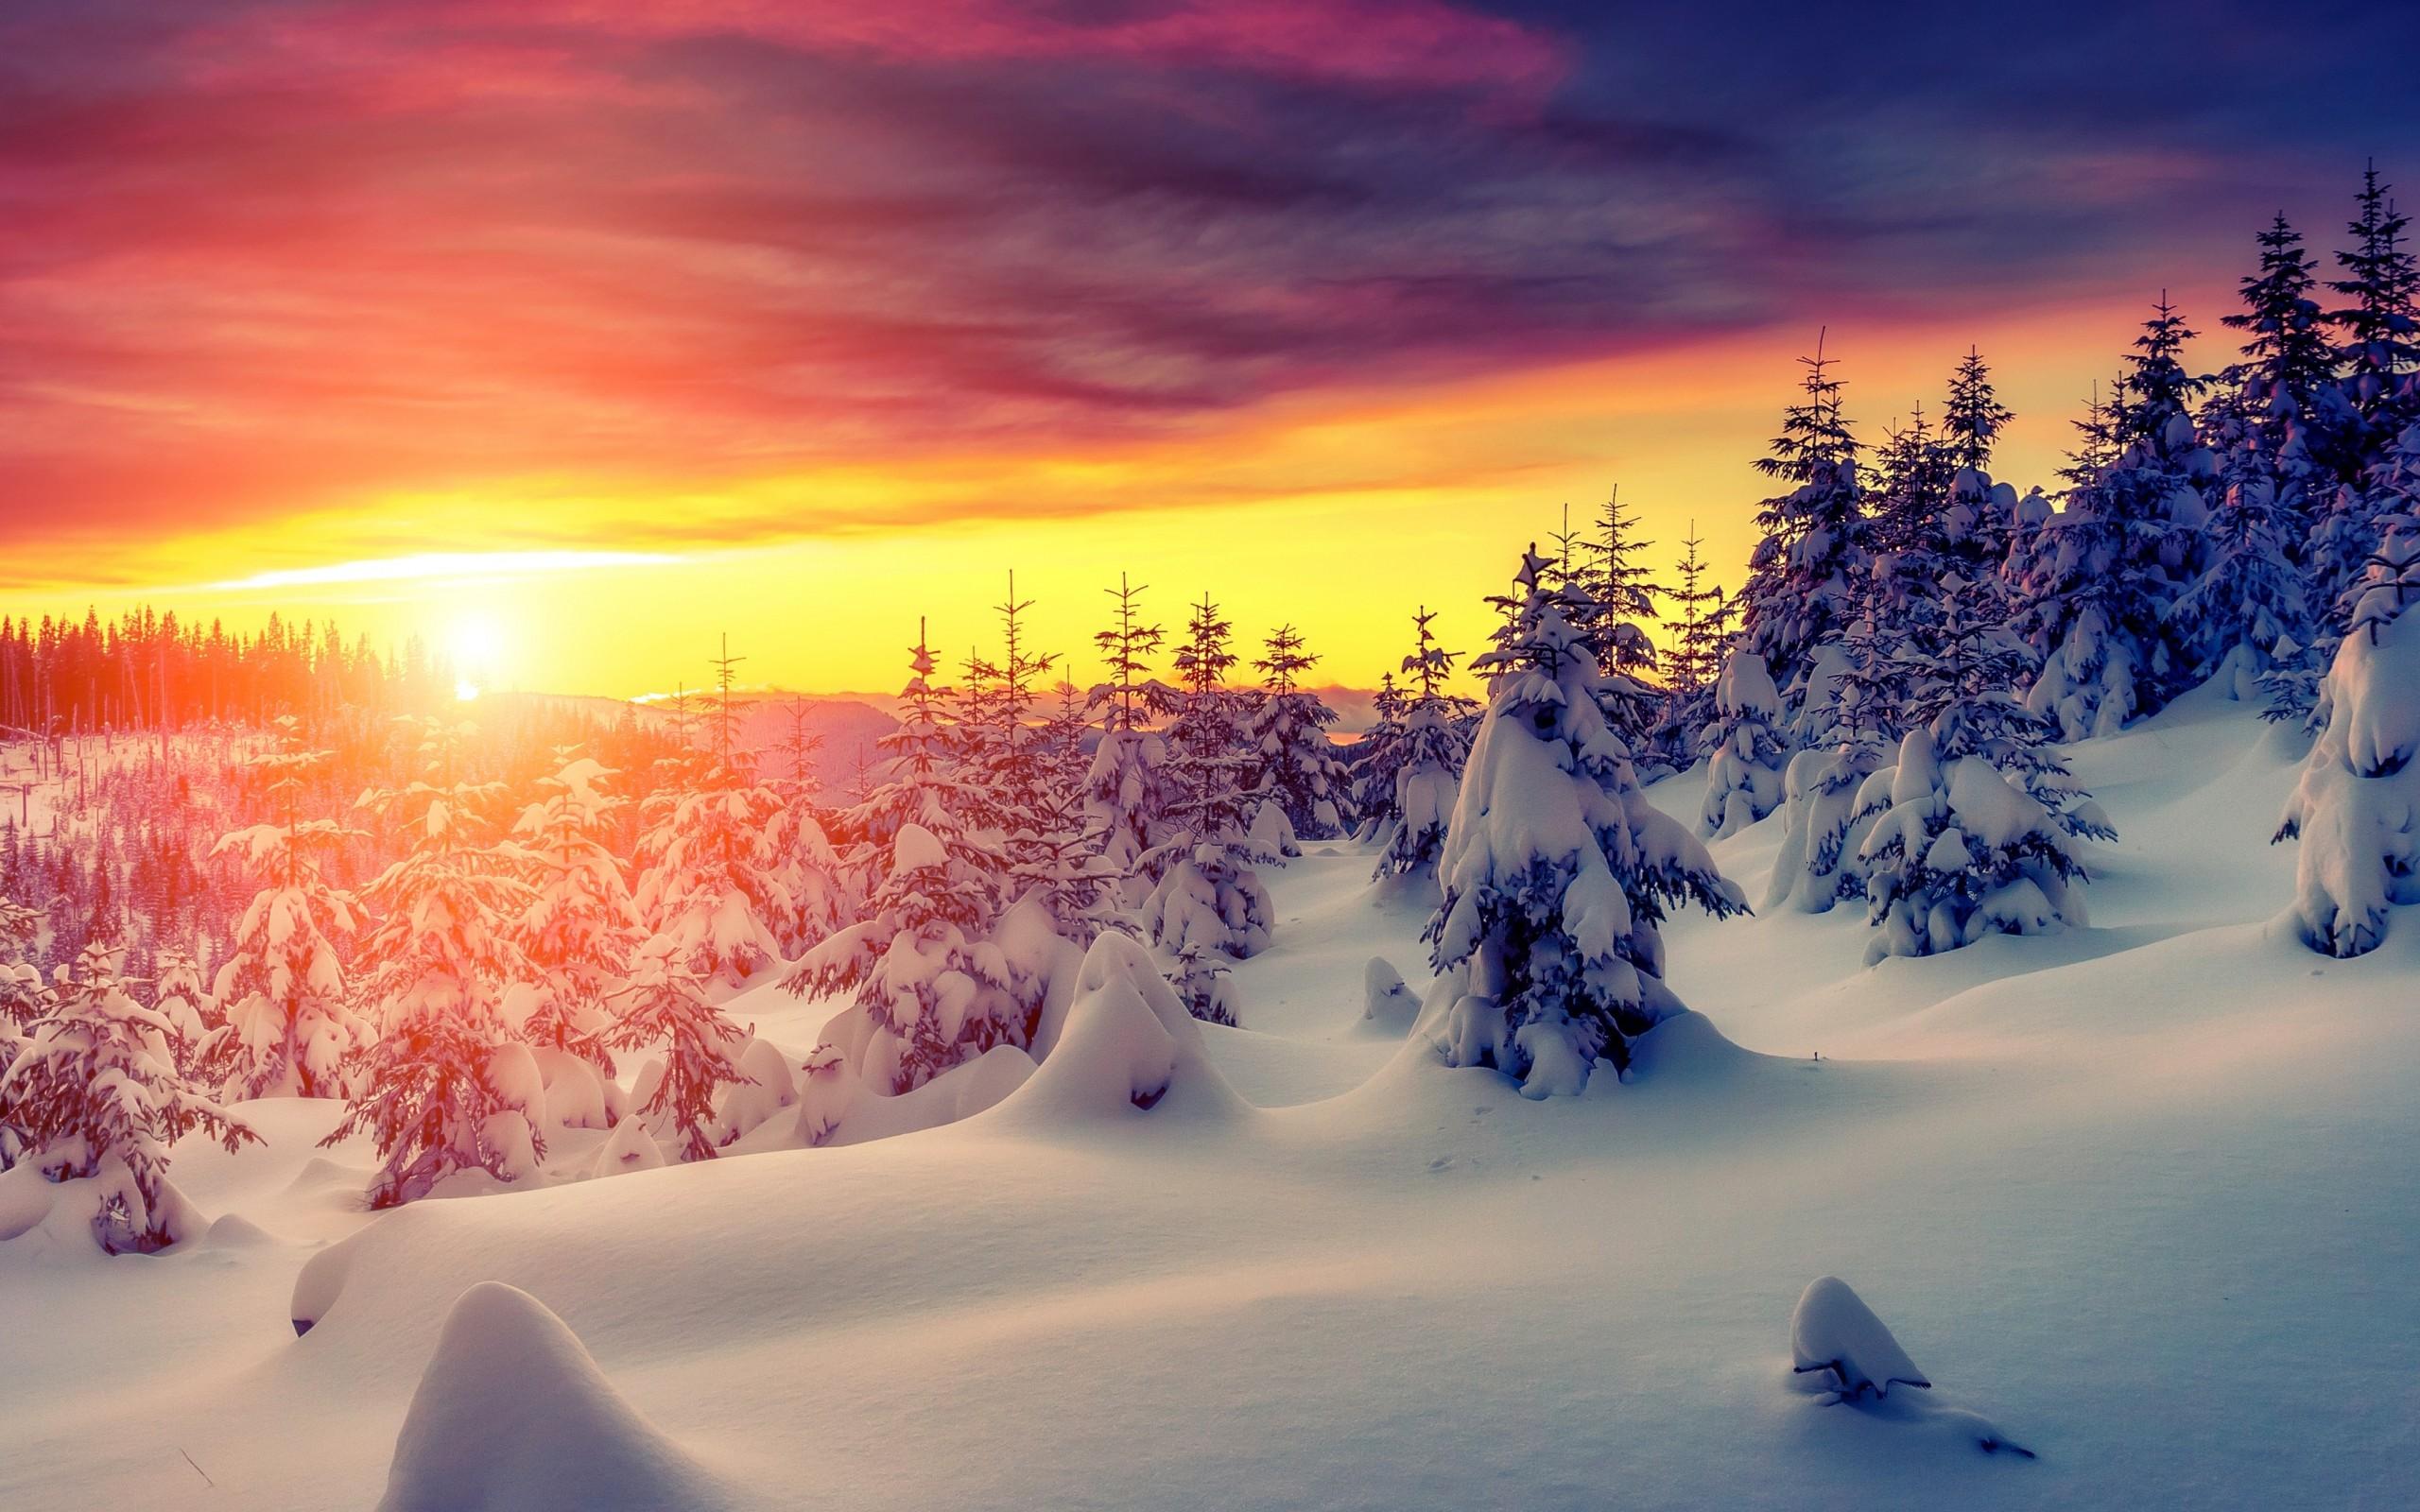 Winter sunset with snow 4K Ultra HD wallpaper 4k WallpaperNet 2560x1600